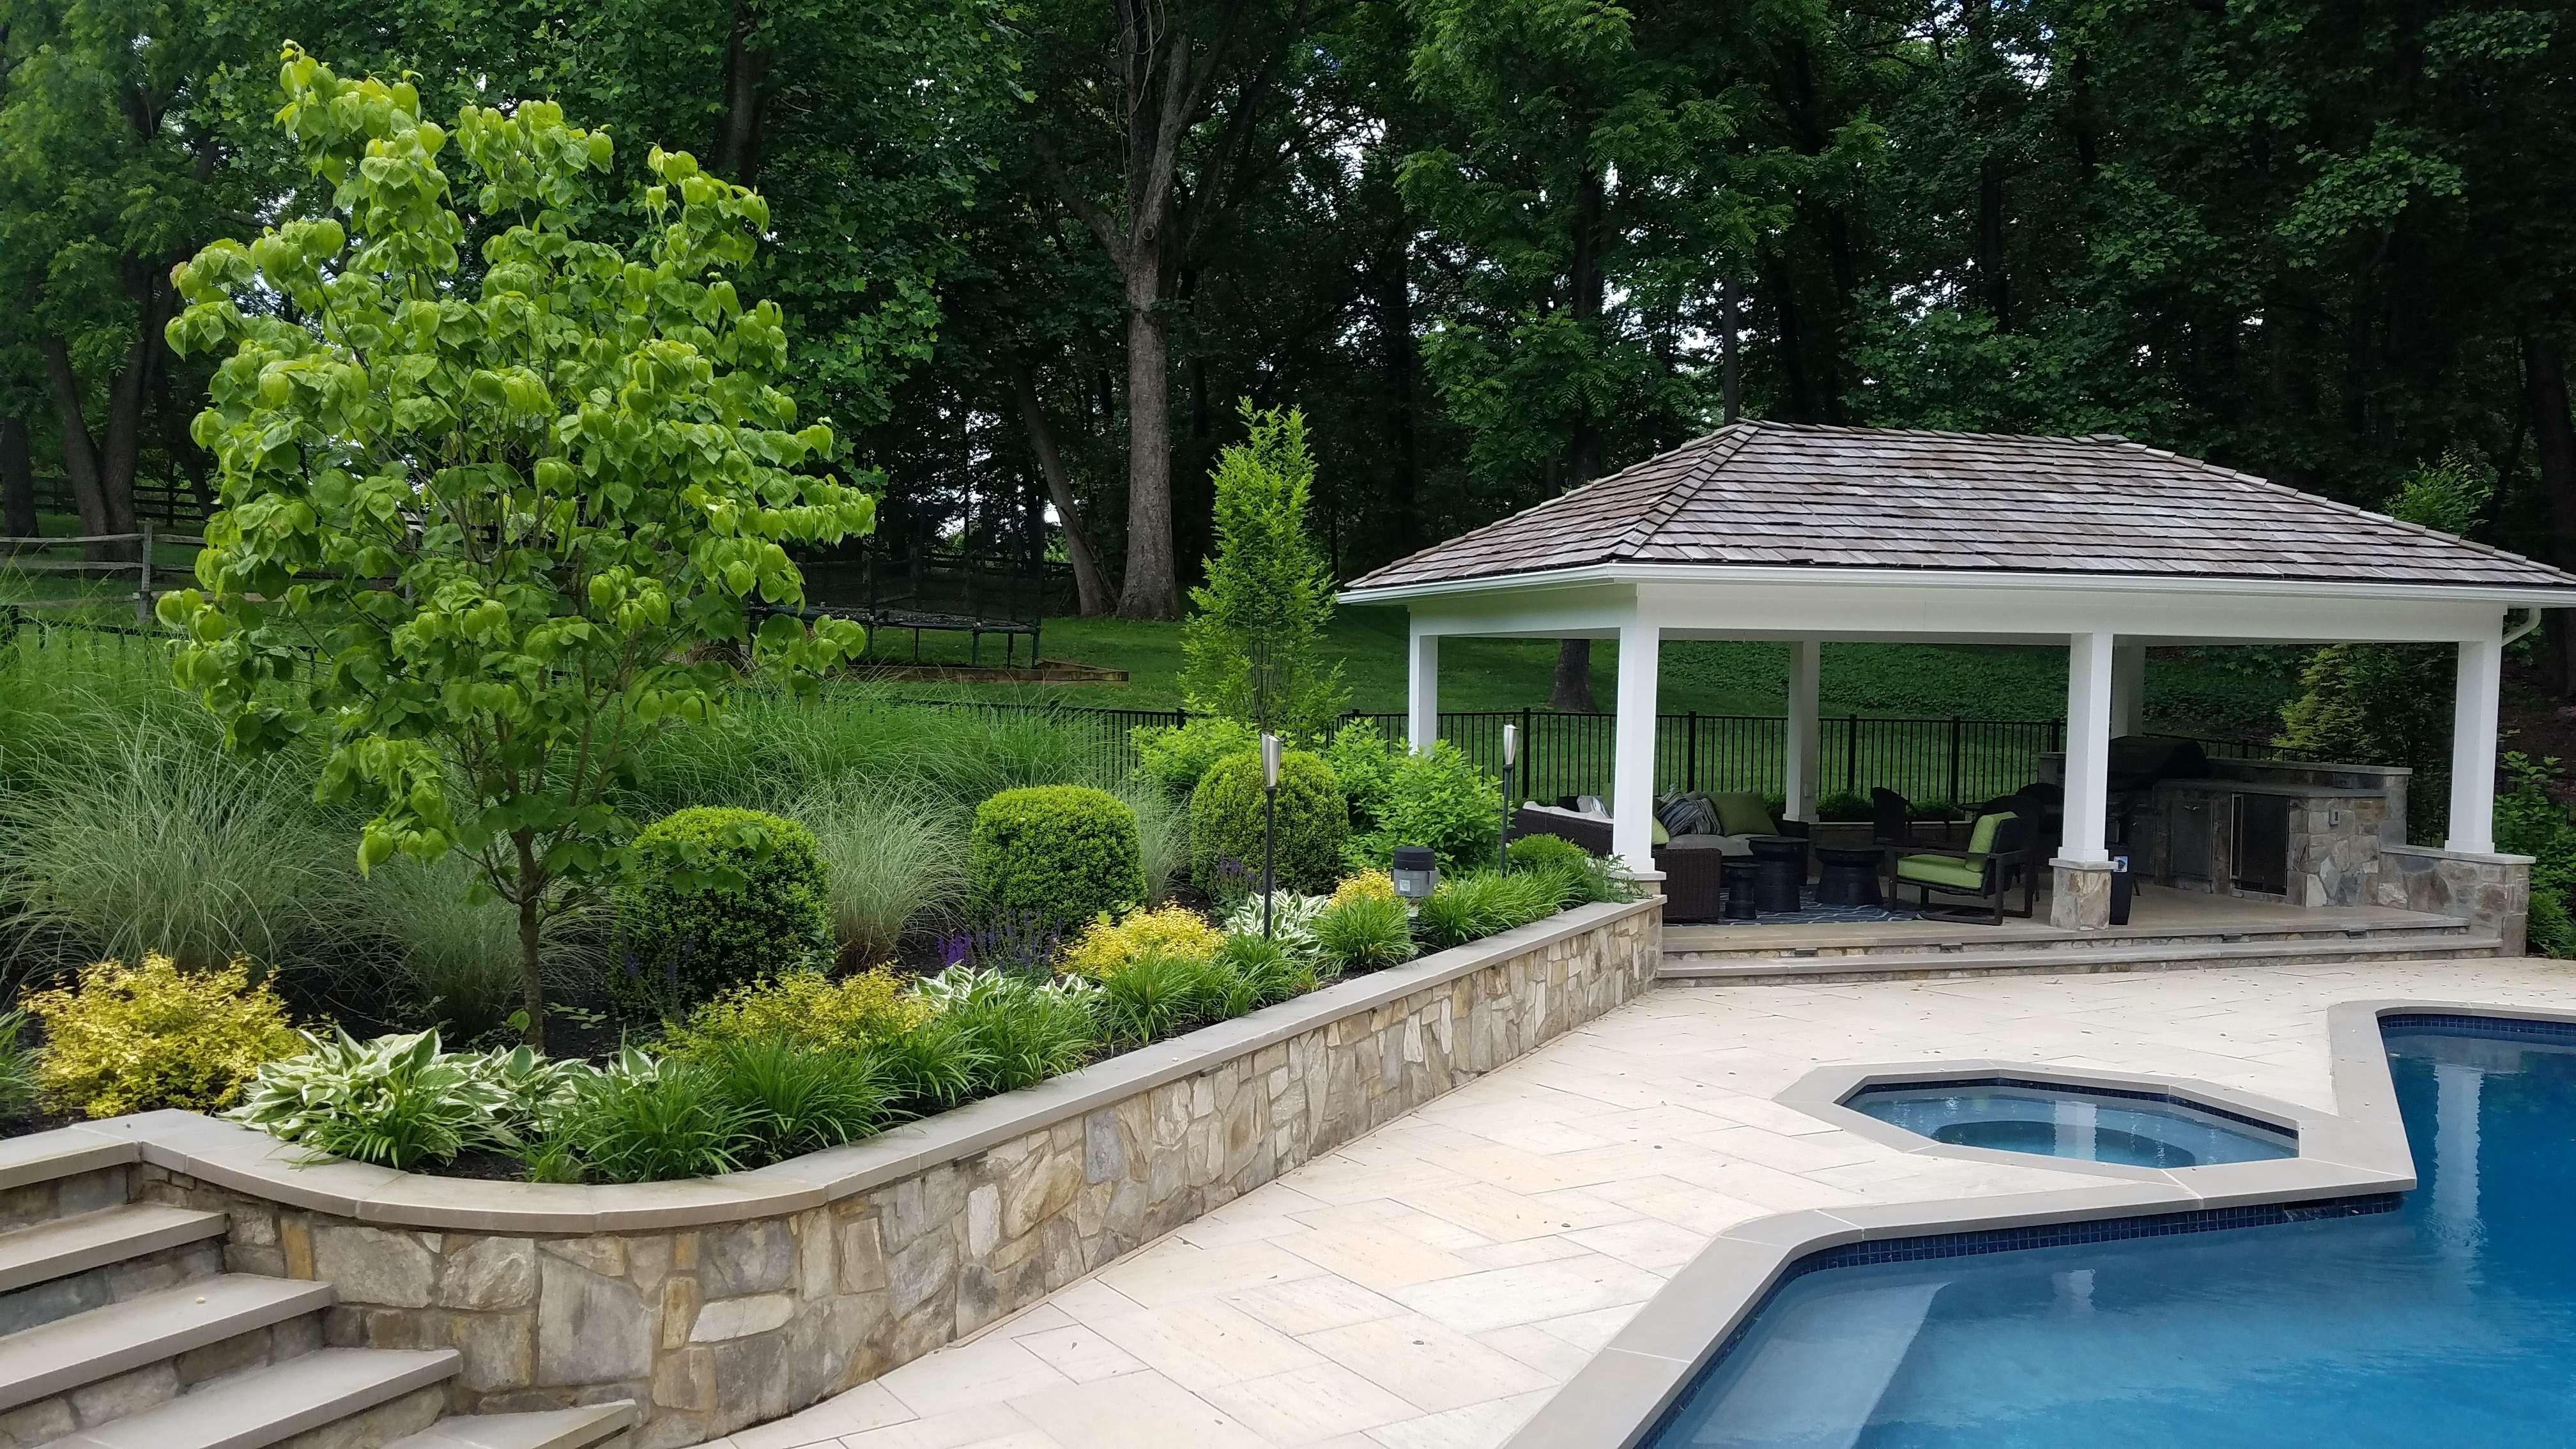 Design & Planting Case Study: Landscaping Great Falls, VA